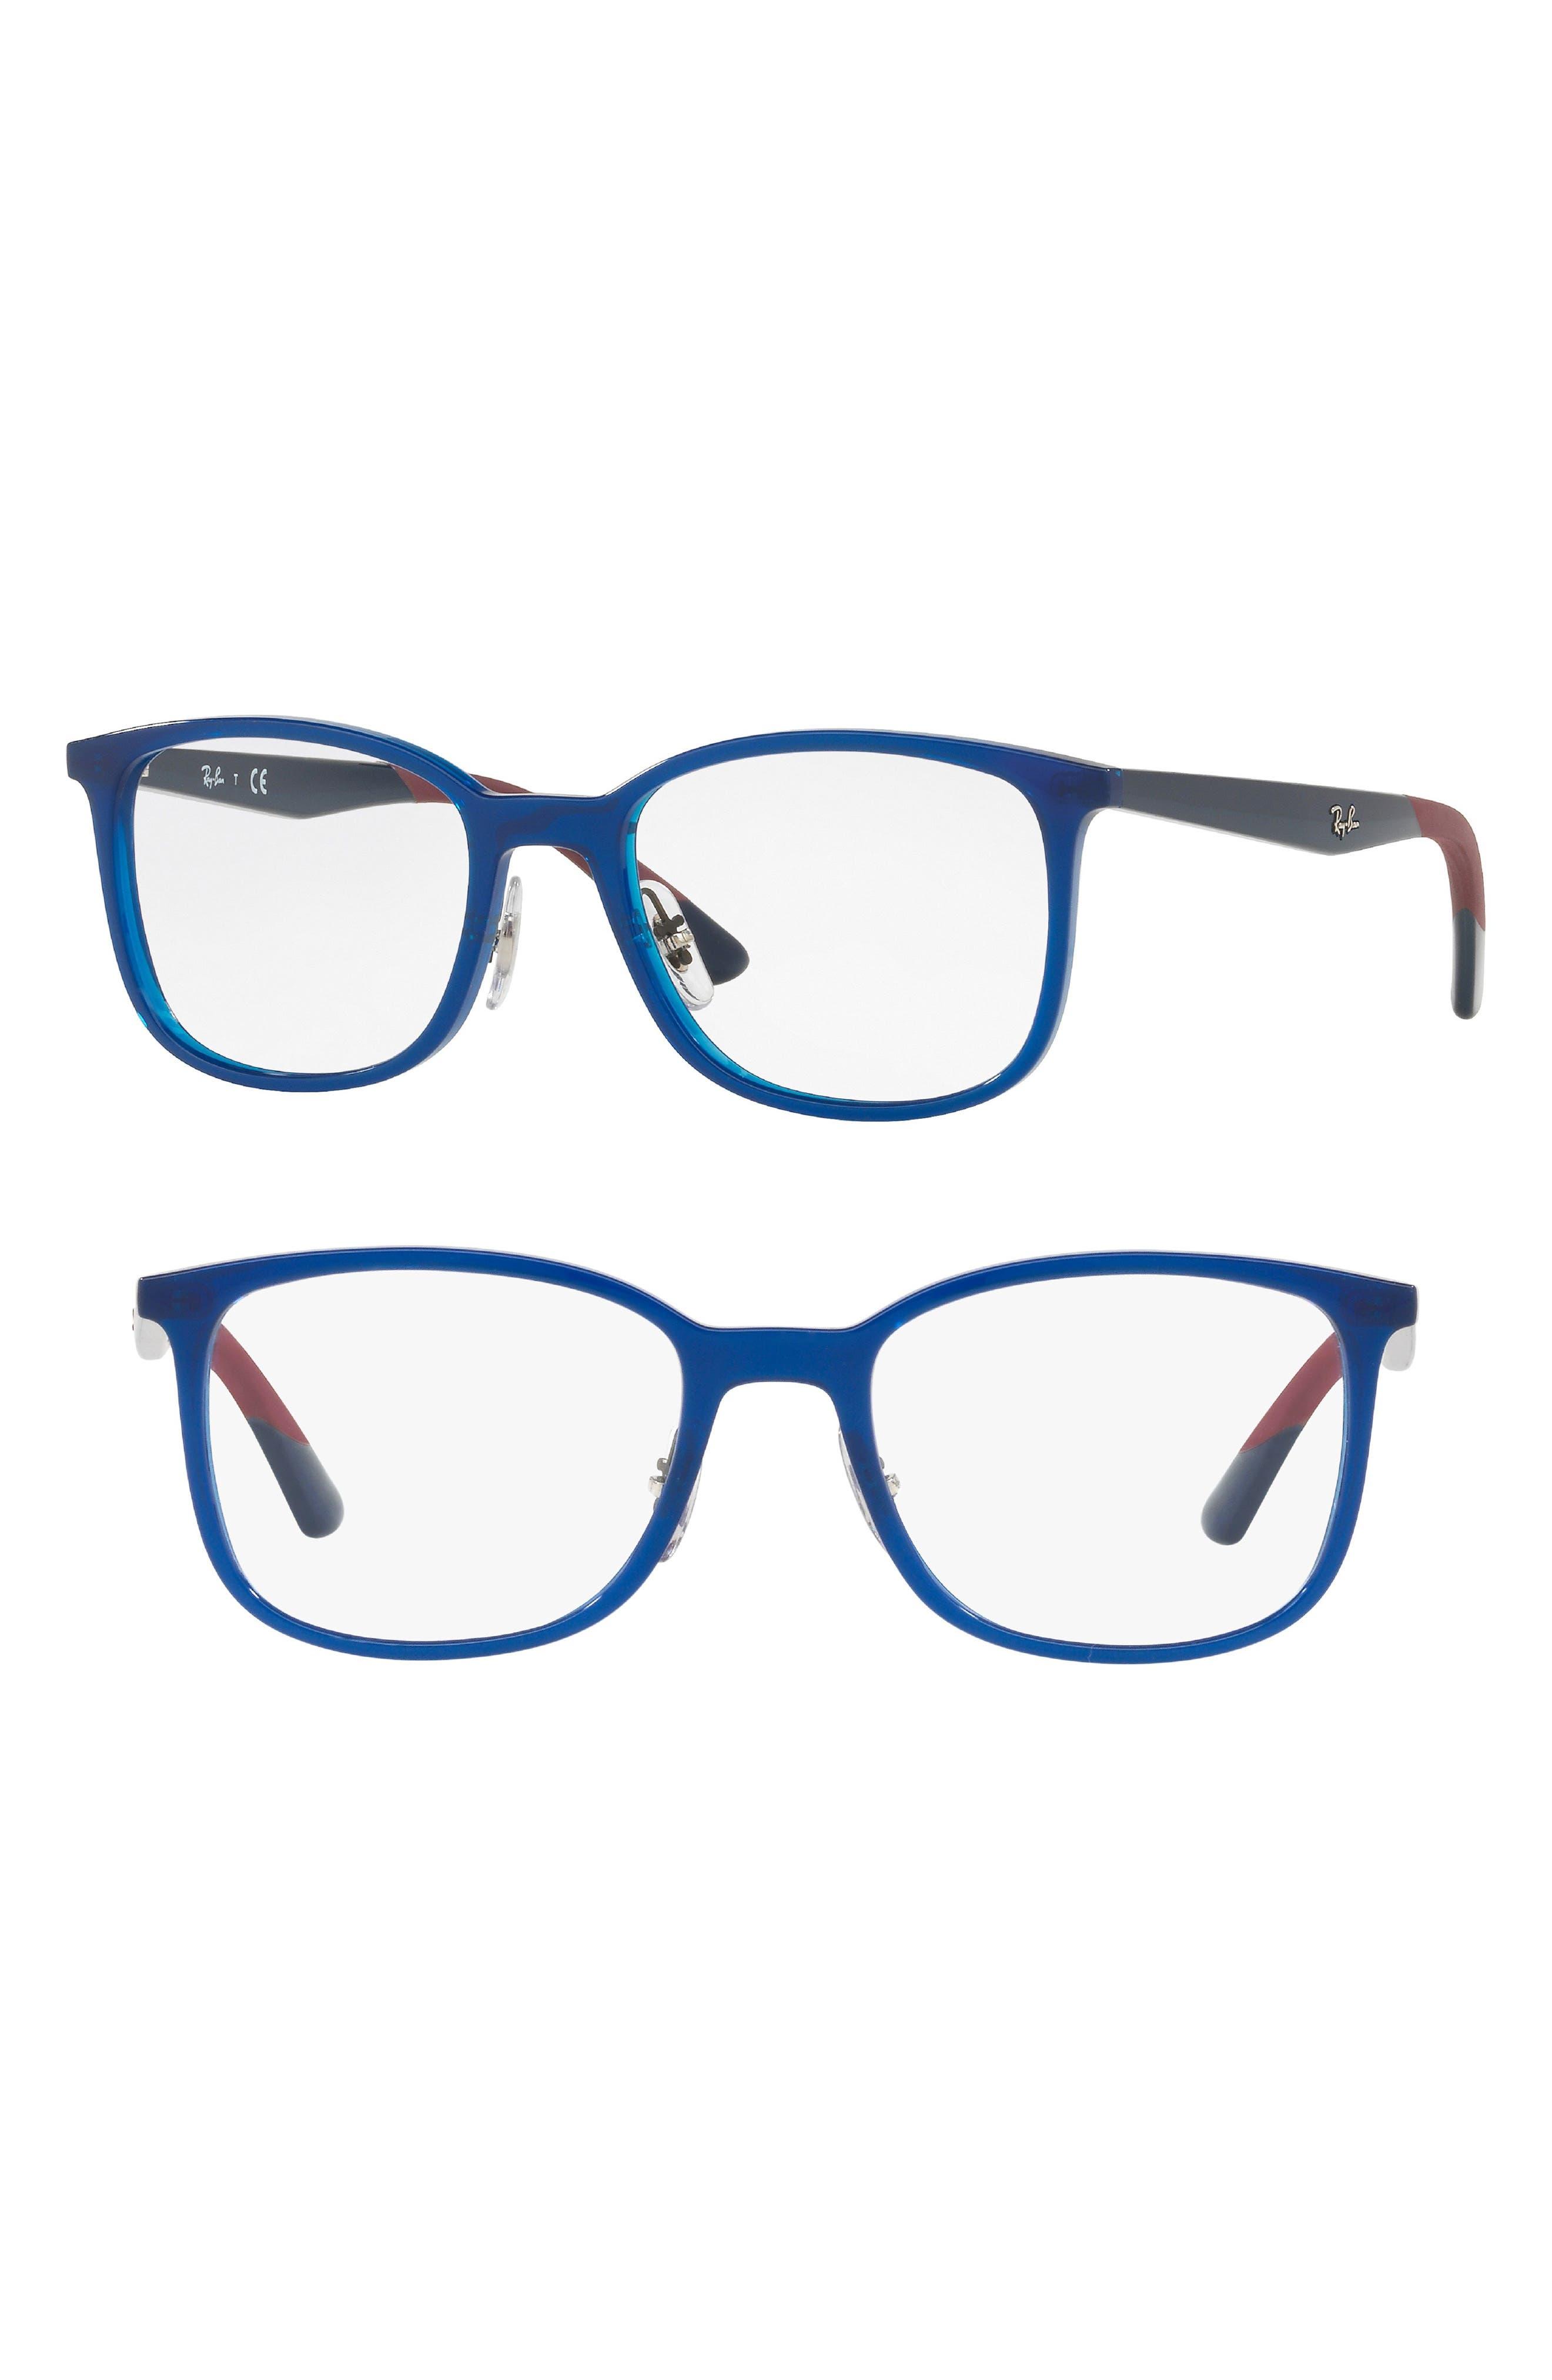 Ray-Ban 7142 50mm Optical Glasses